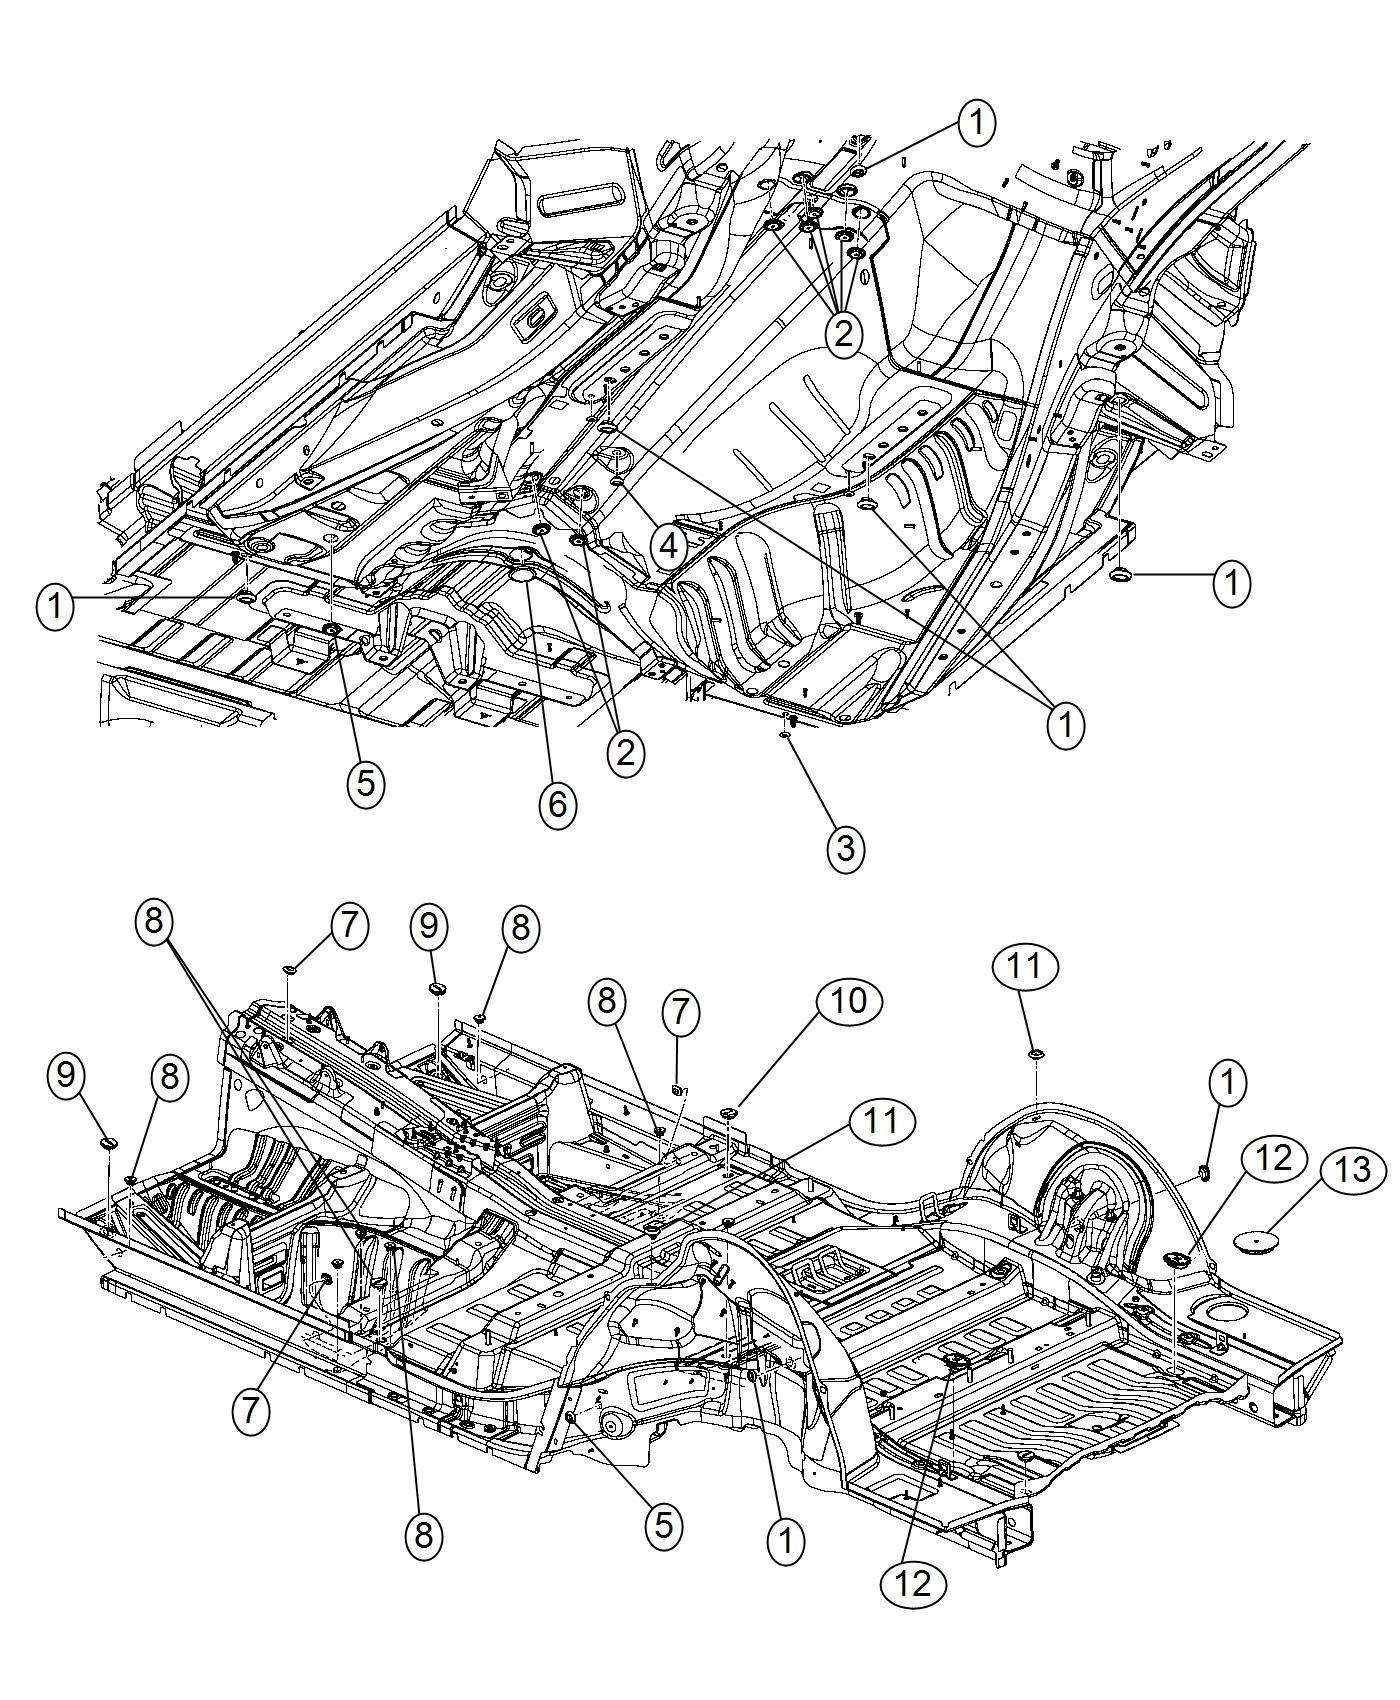 2017 Dodge Durango Plug. Sealing. 27mm, body side, body